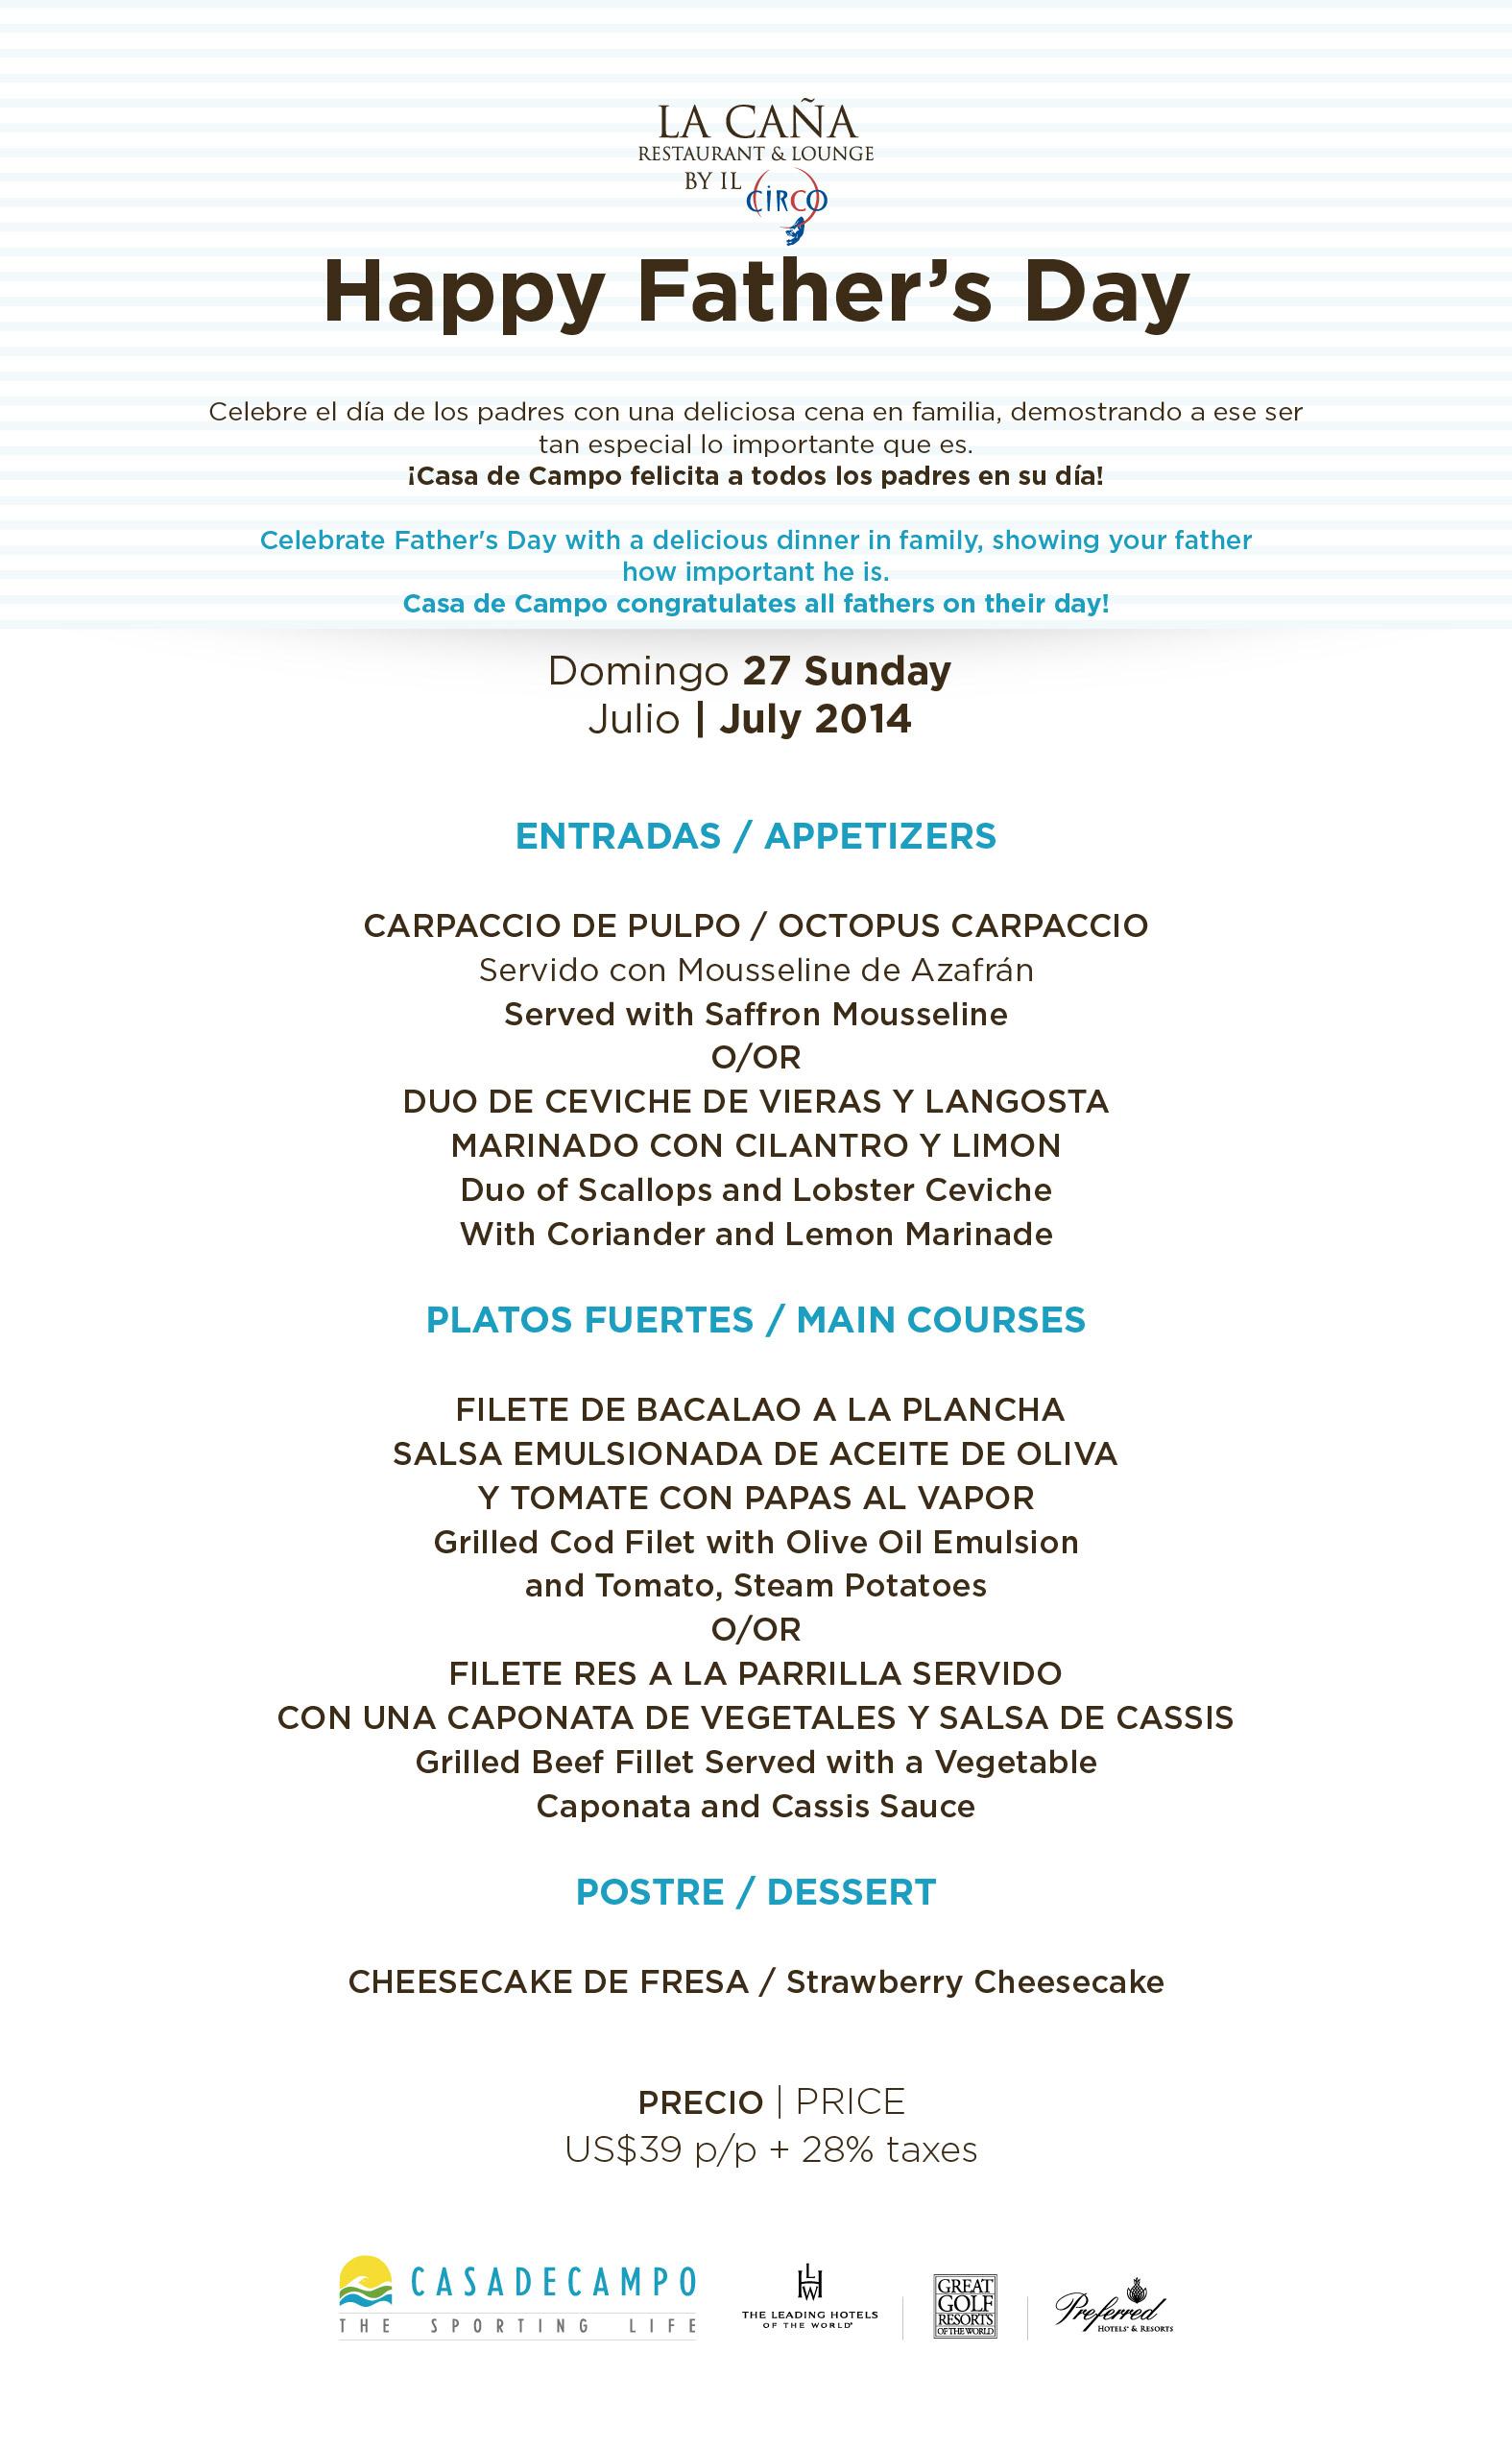 menu_la caña_father's day 2014-03